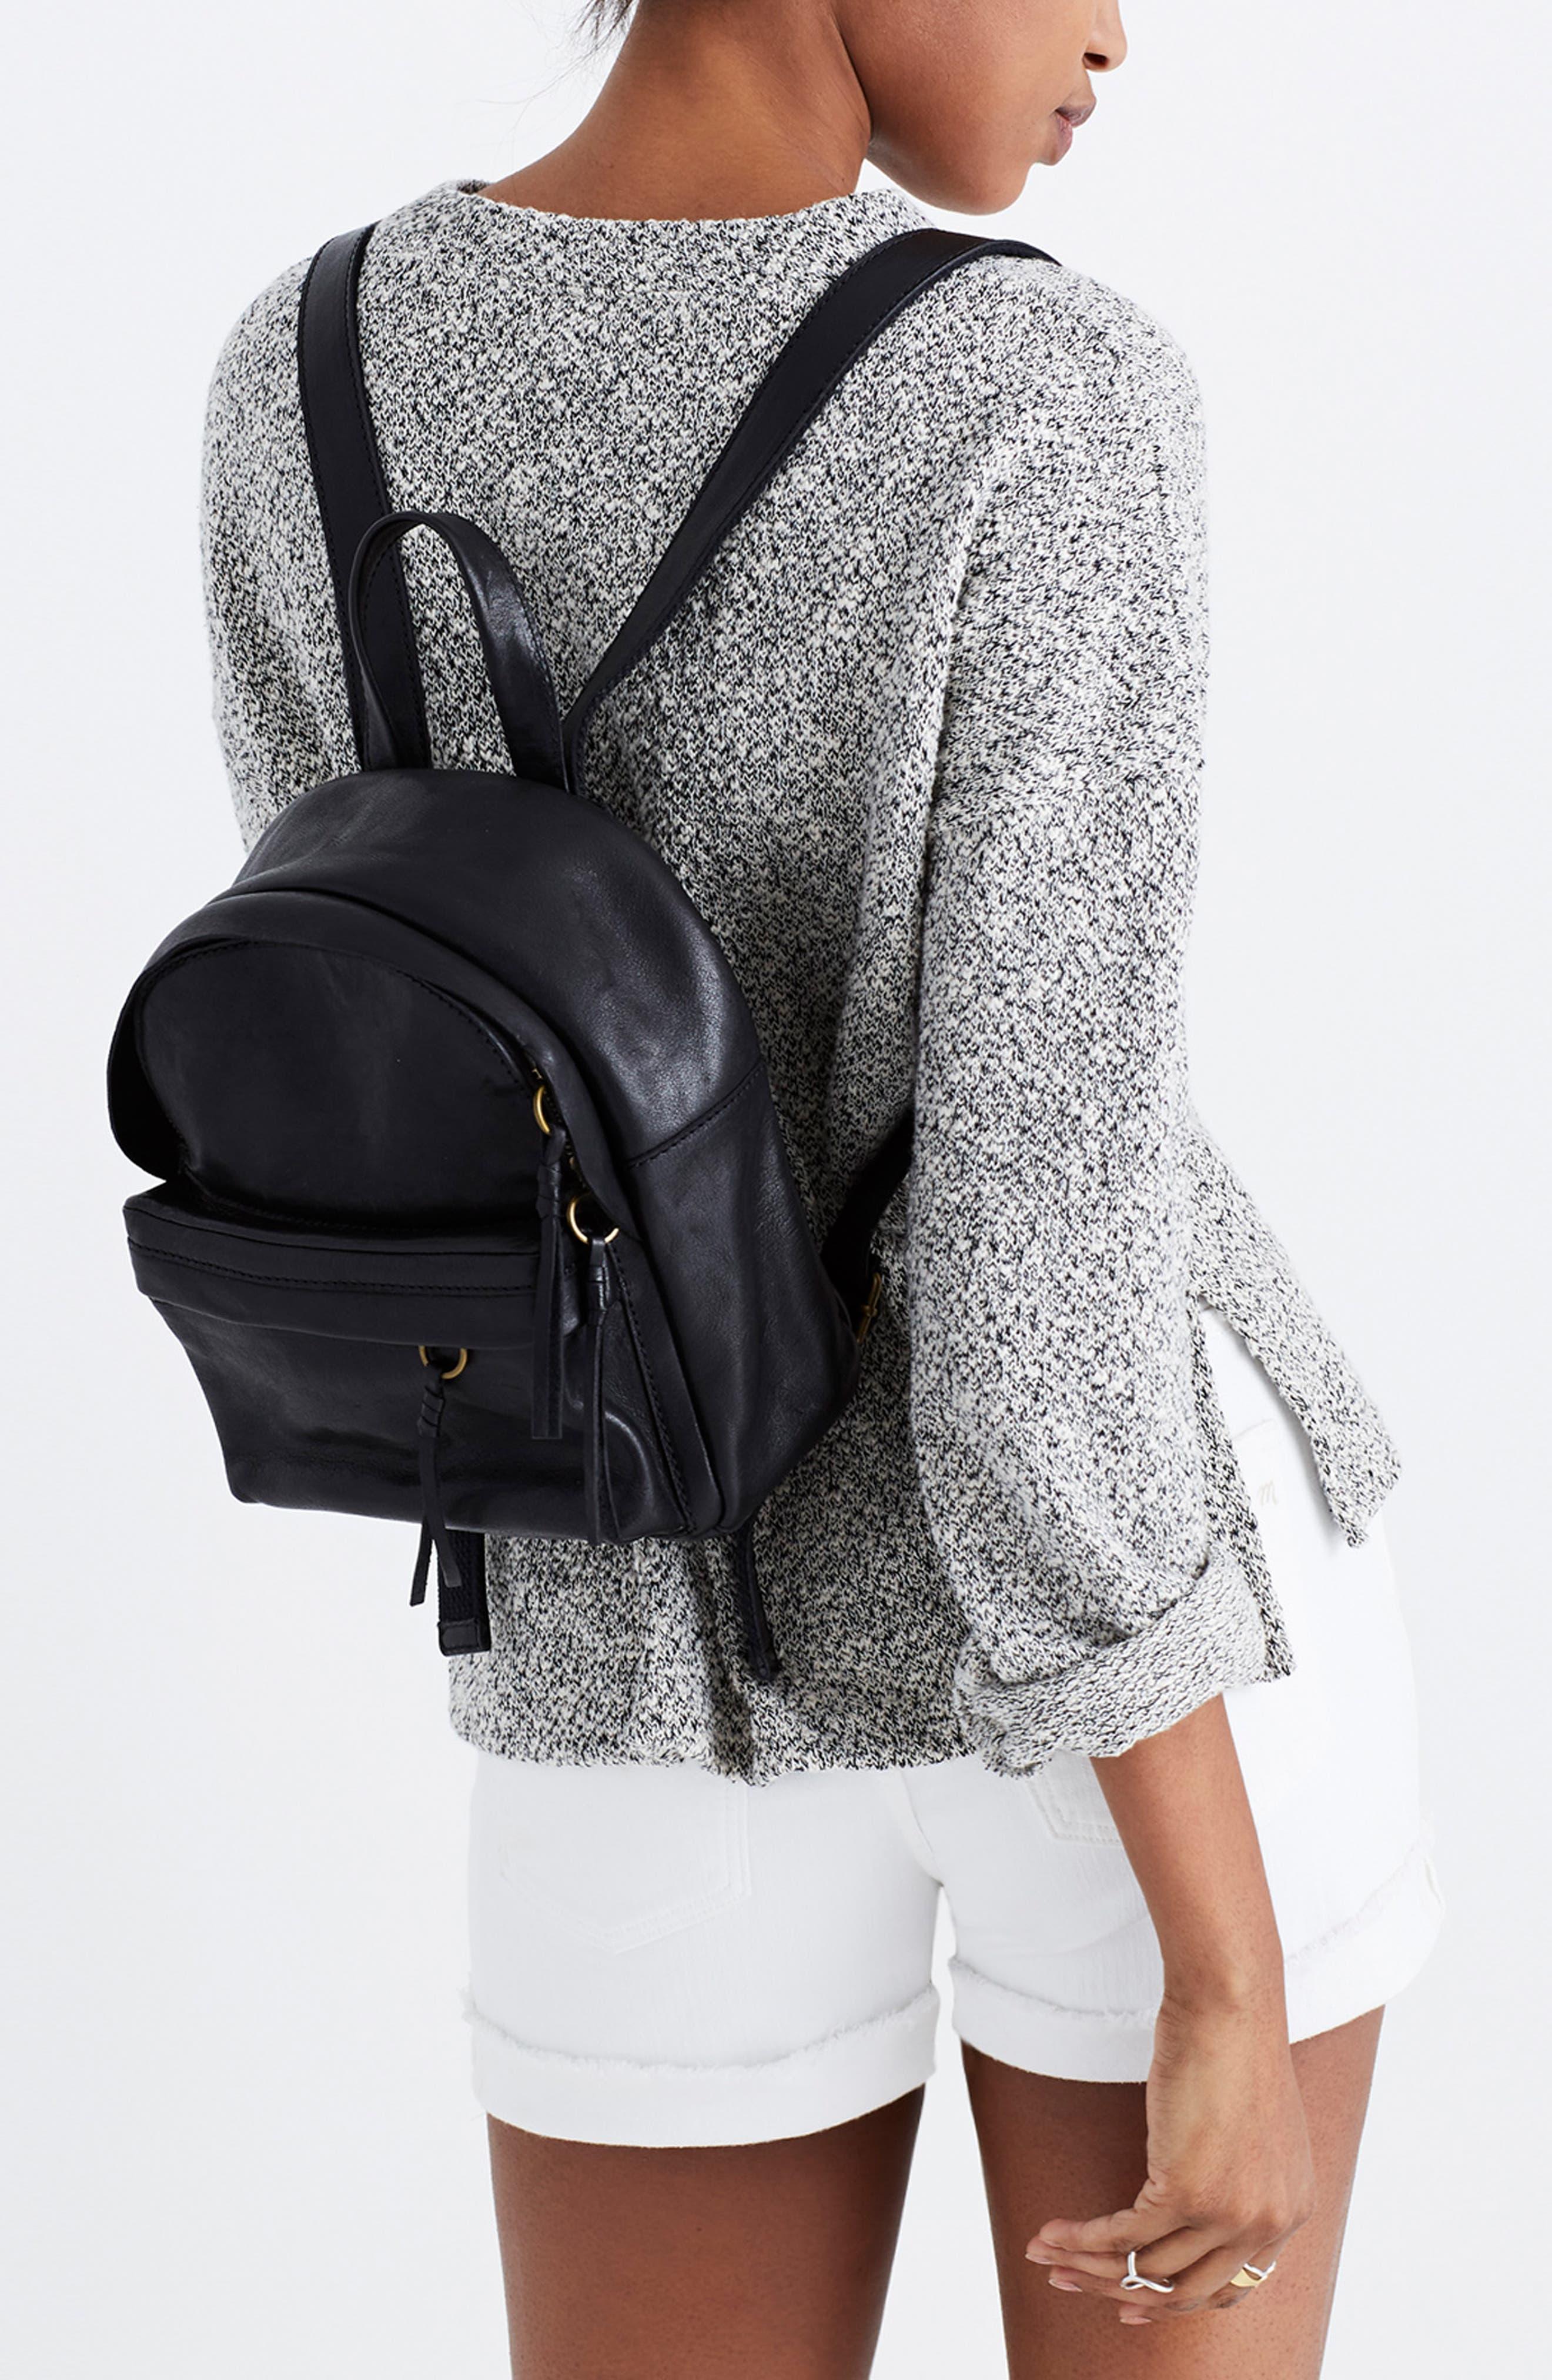 MADEWELL, Mini Lorimer Leather Backpack, Alternate thumbnail 2, color, TRUE BLACK